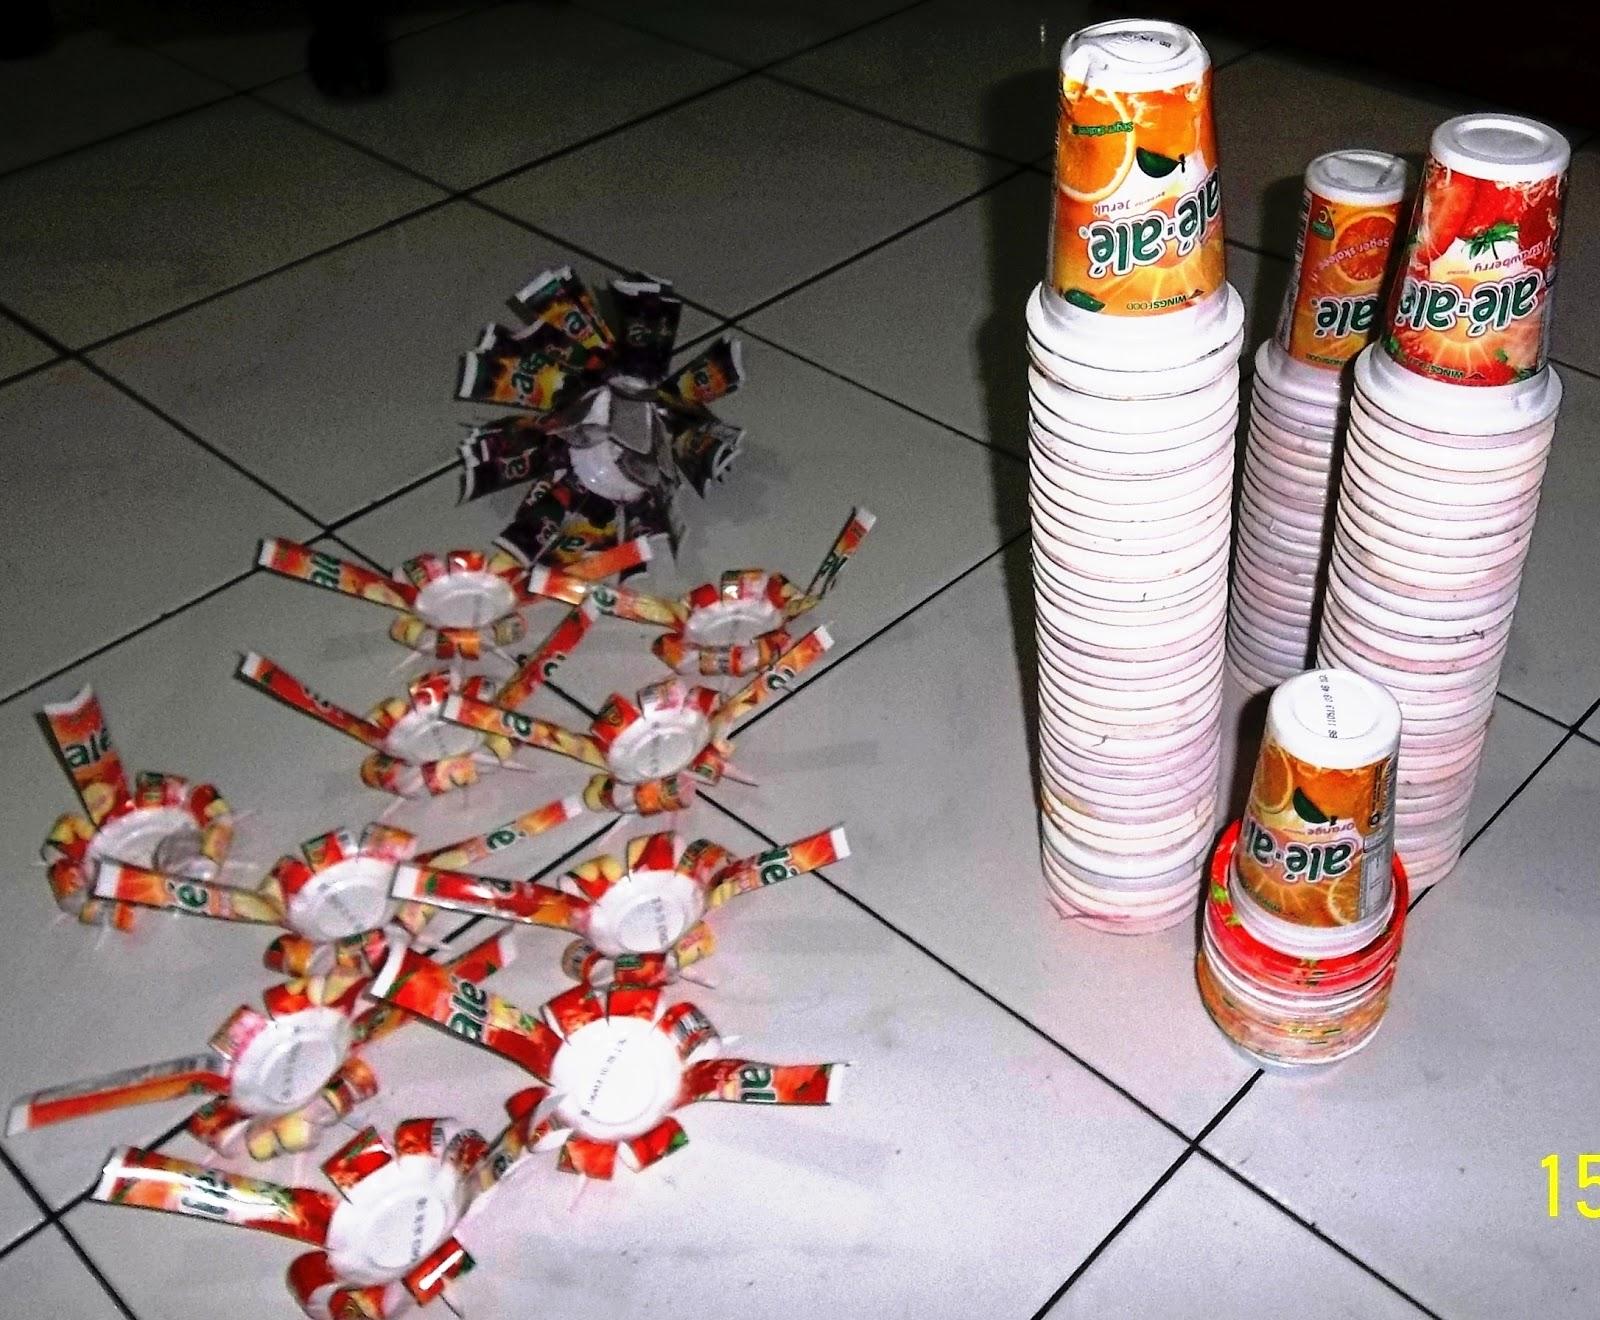 Gambar Gelas Plastik Ale-ale sebelum di proses dan setelah menjadi hasil  kreasi berupa Tirai lihat gambar sbb   765d23bd96